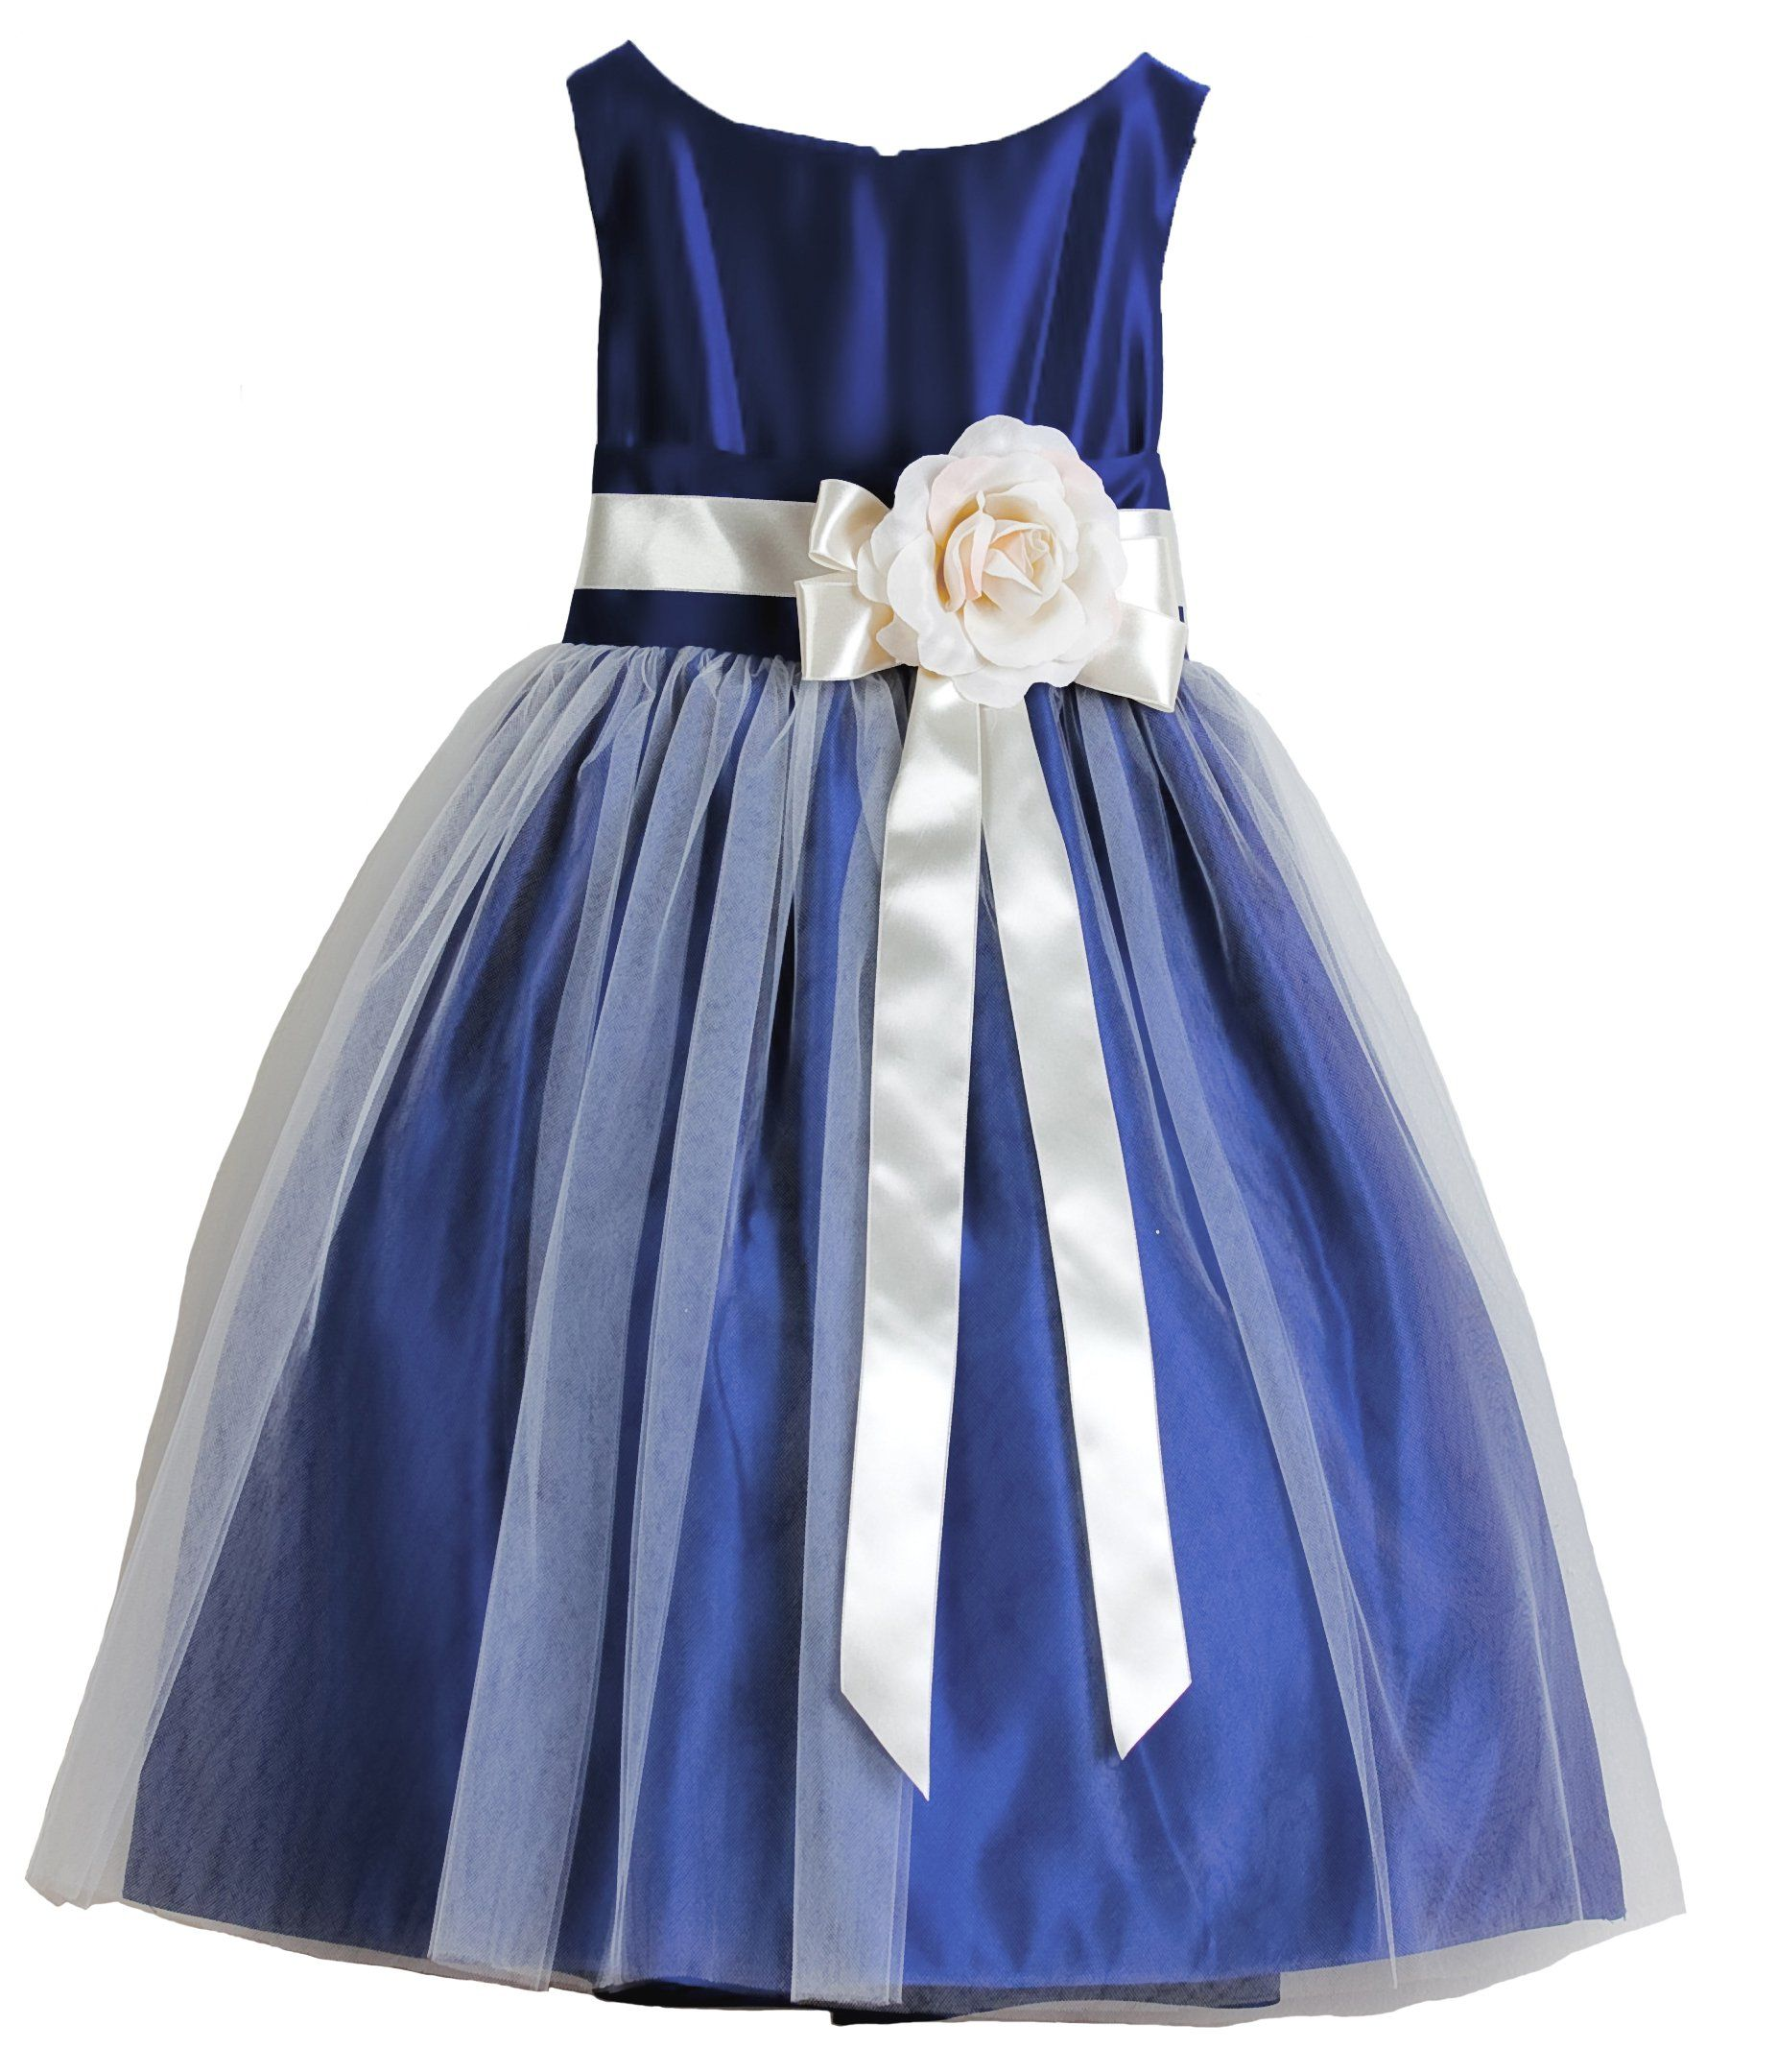 Amazon.com: Sweet Kids Little Girls\' Vintage Style Satin and Tulle ...